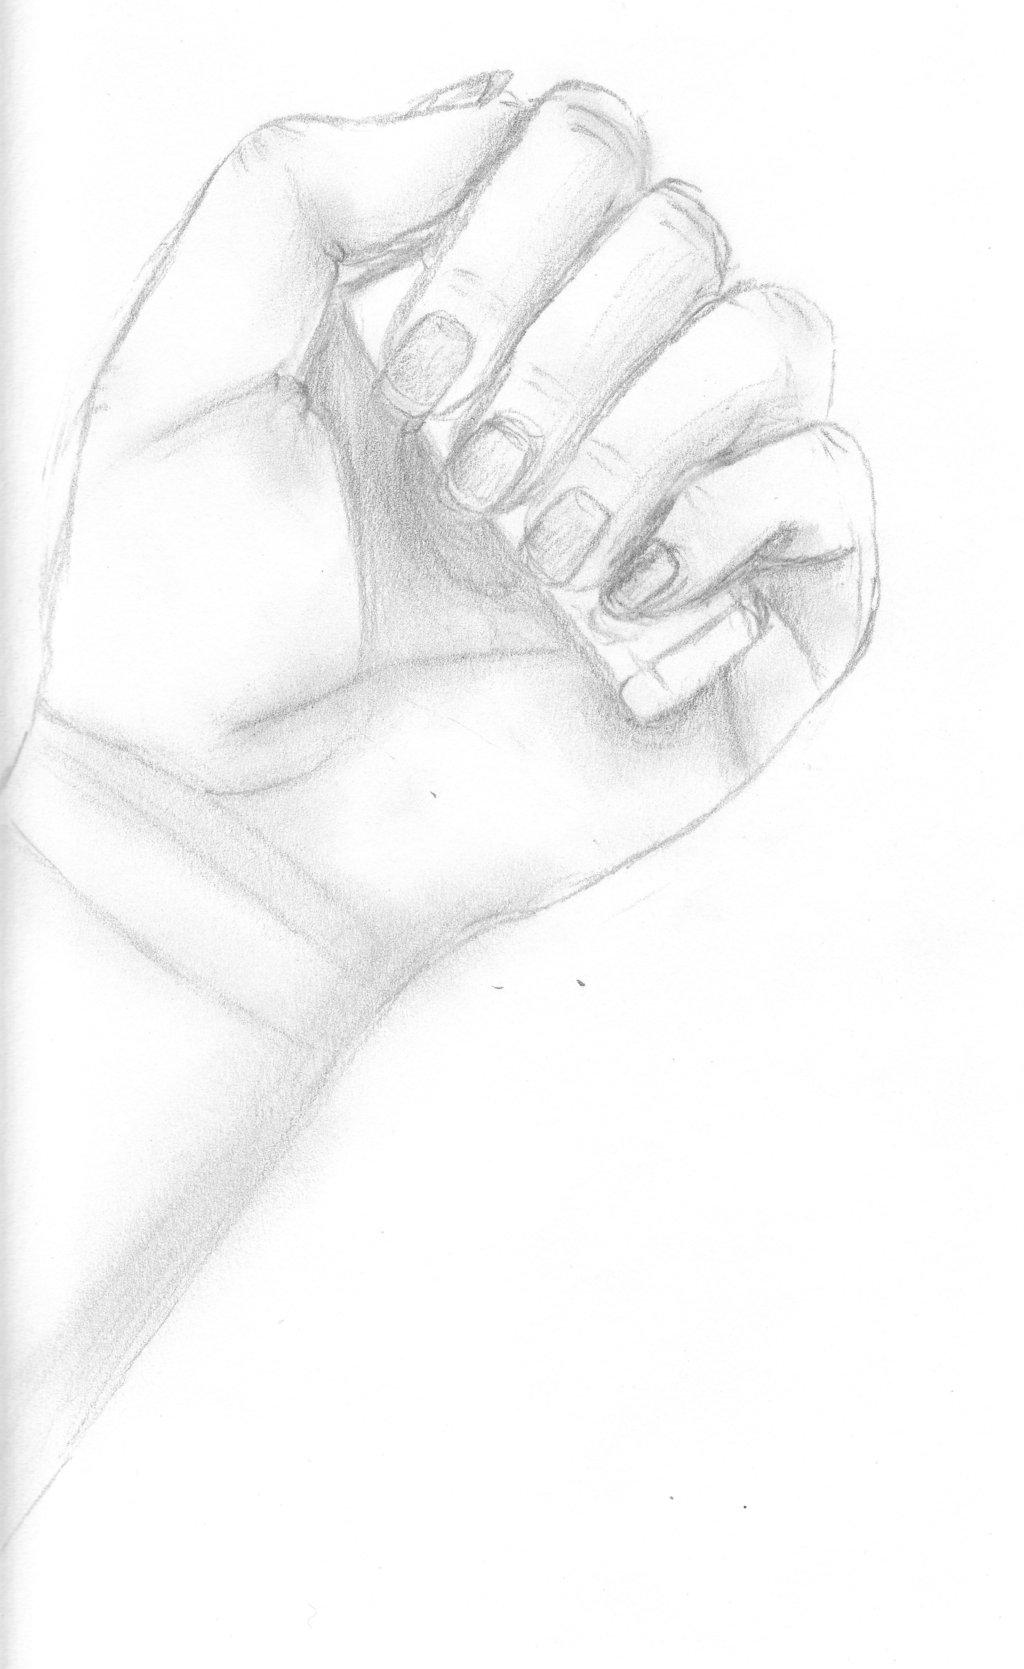 1024x1669 Hand Holding Eraser By Pbsma